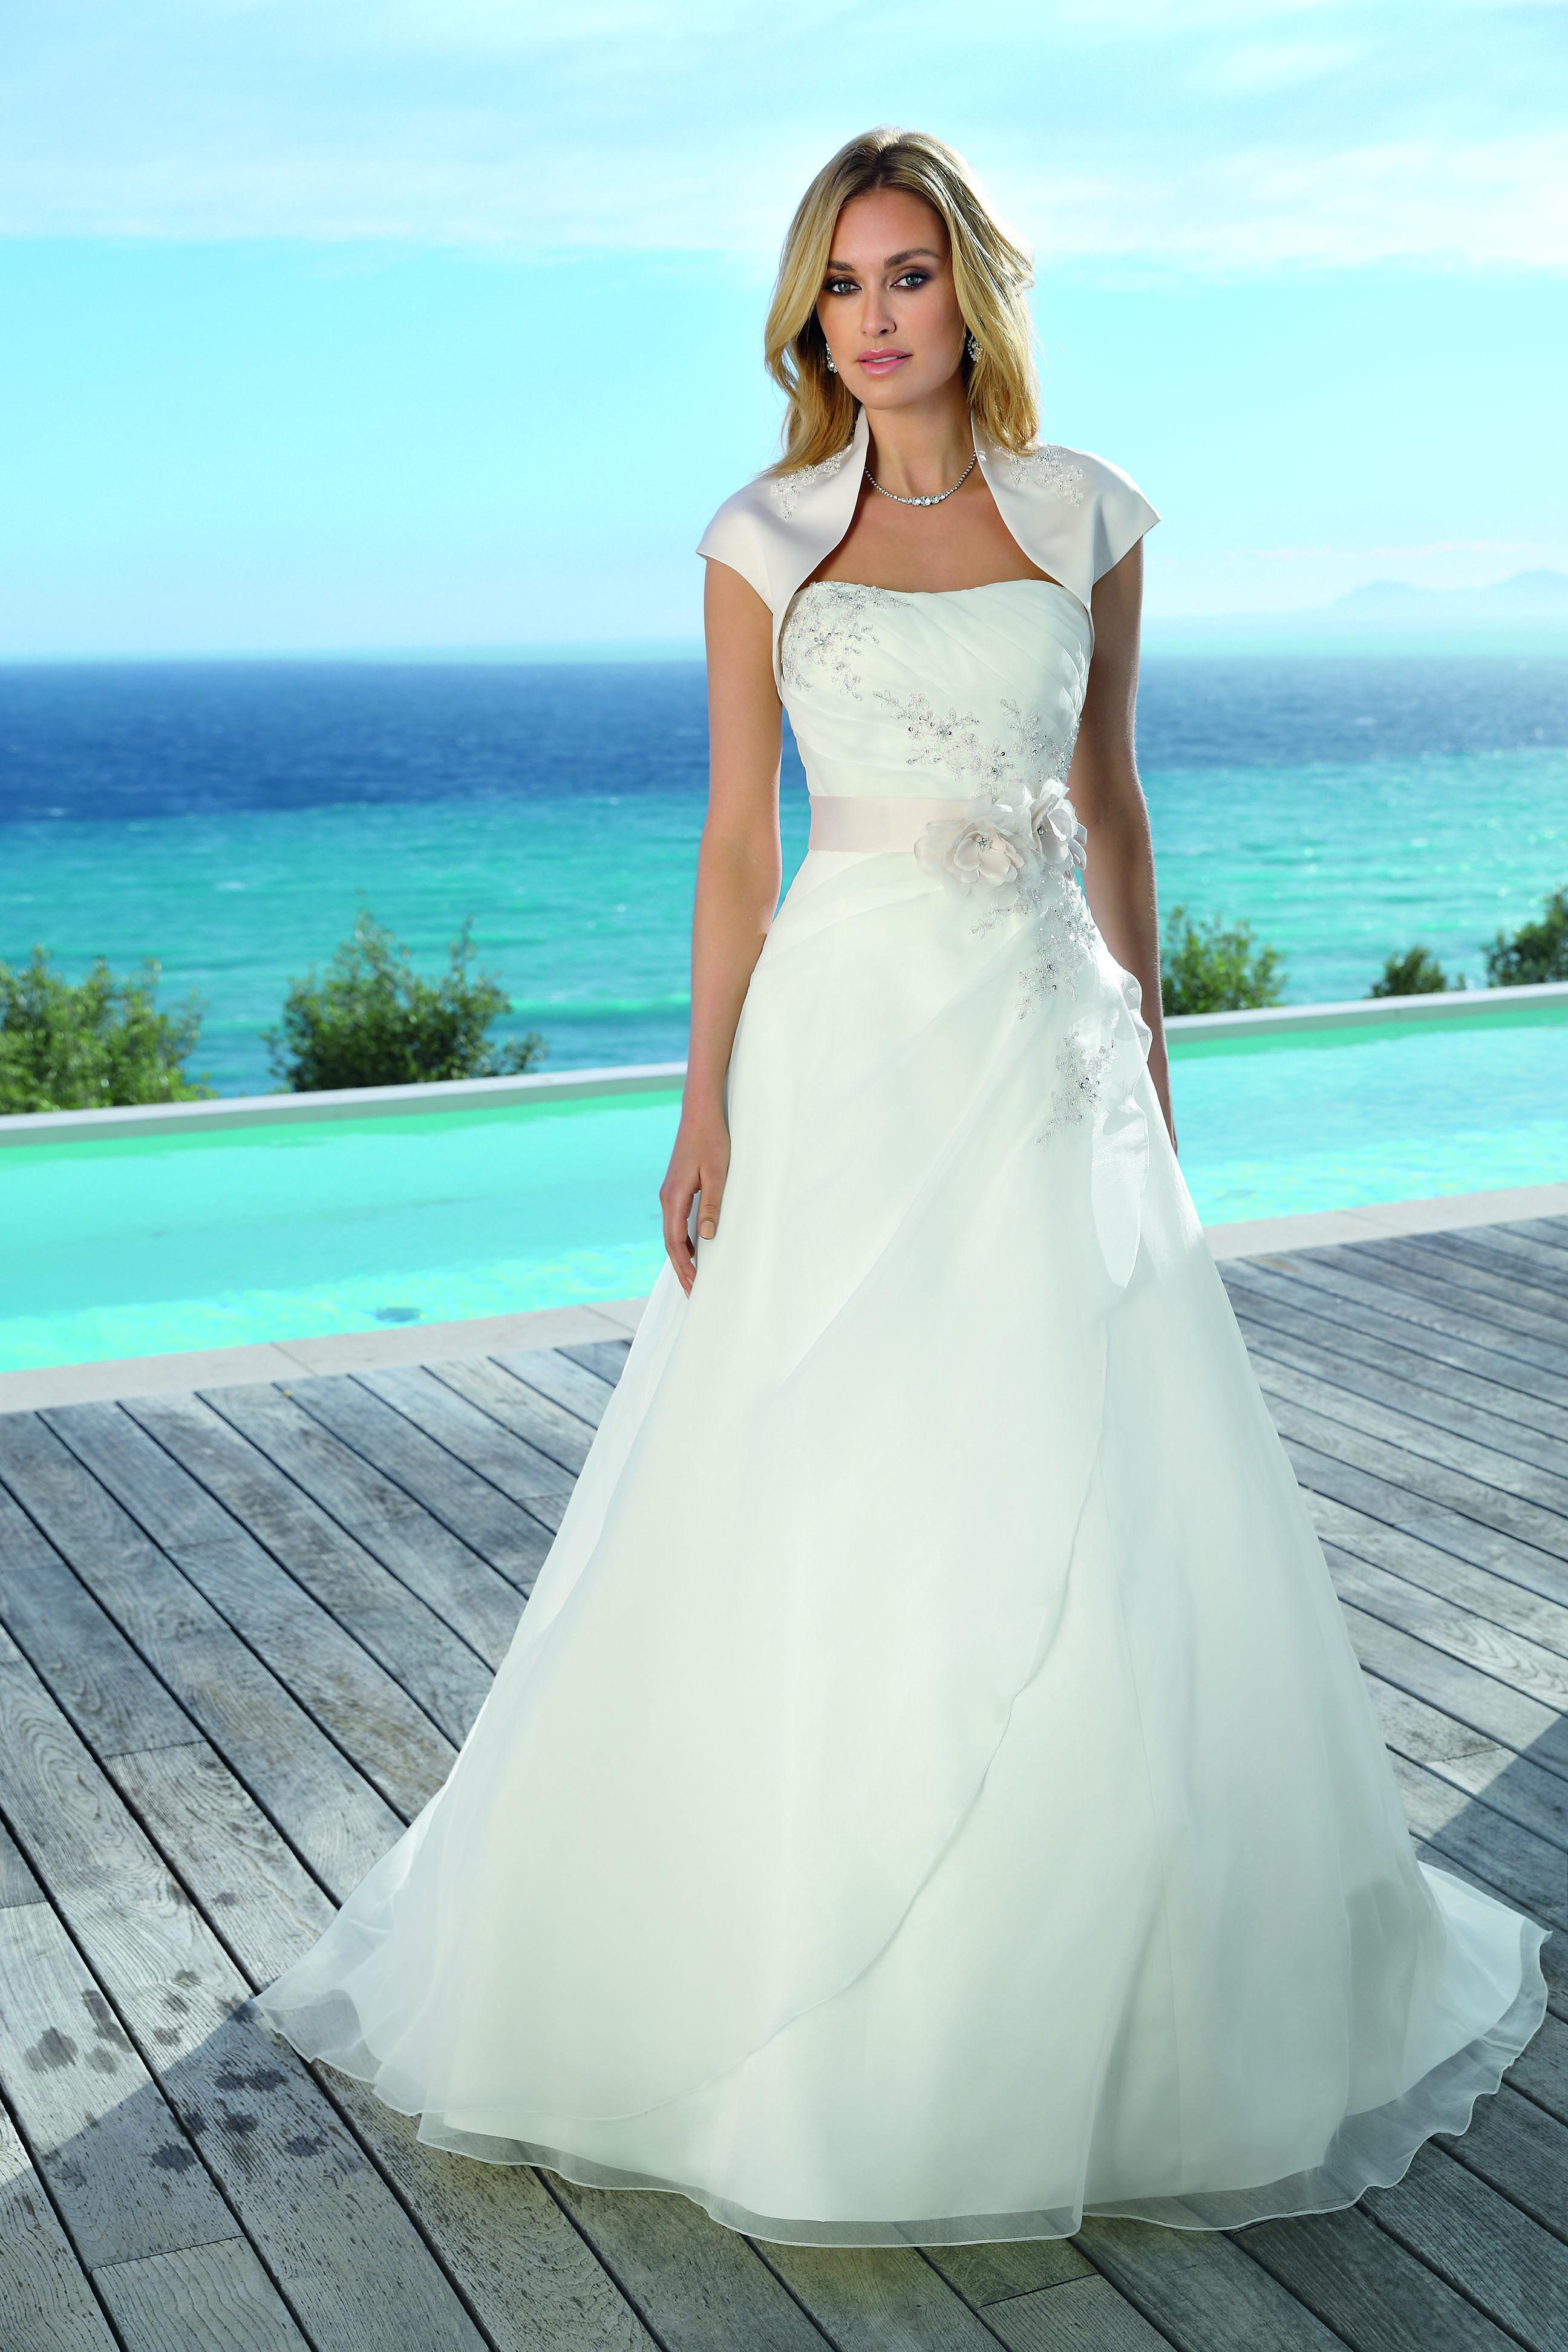 Ladybird 318044 Art 28075 Valkengoed Wedding Fashion Amersfoort ...